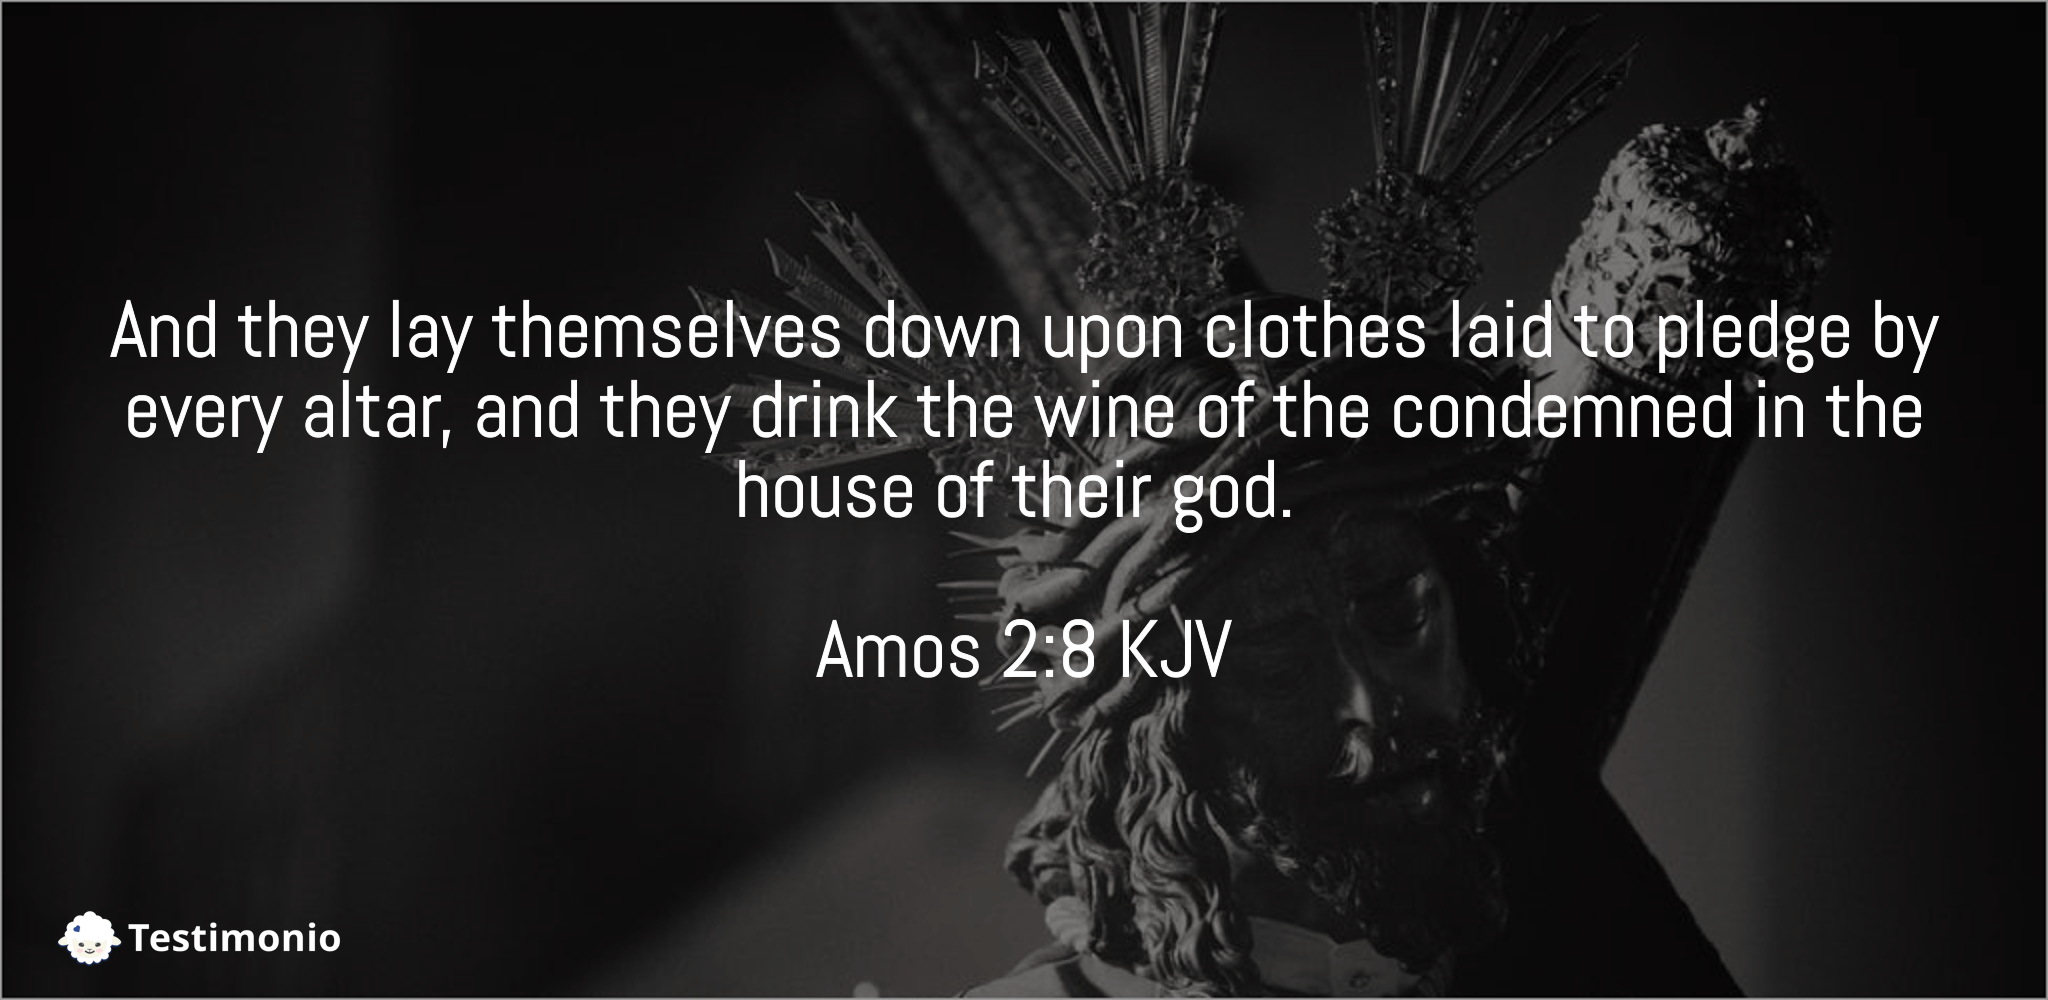 Amos 2:8